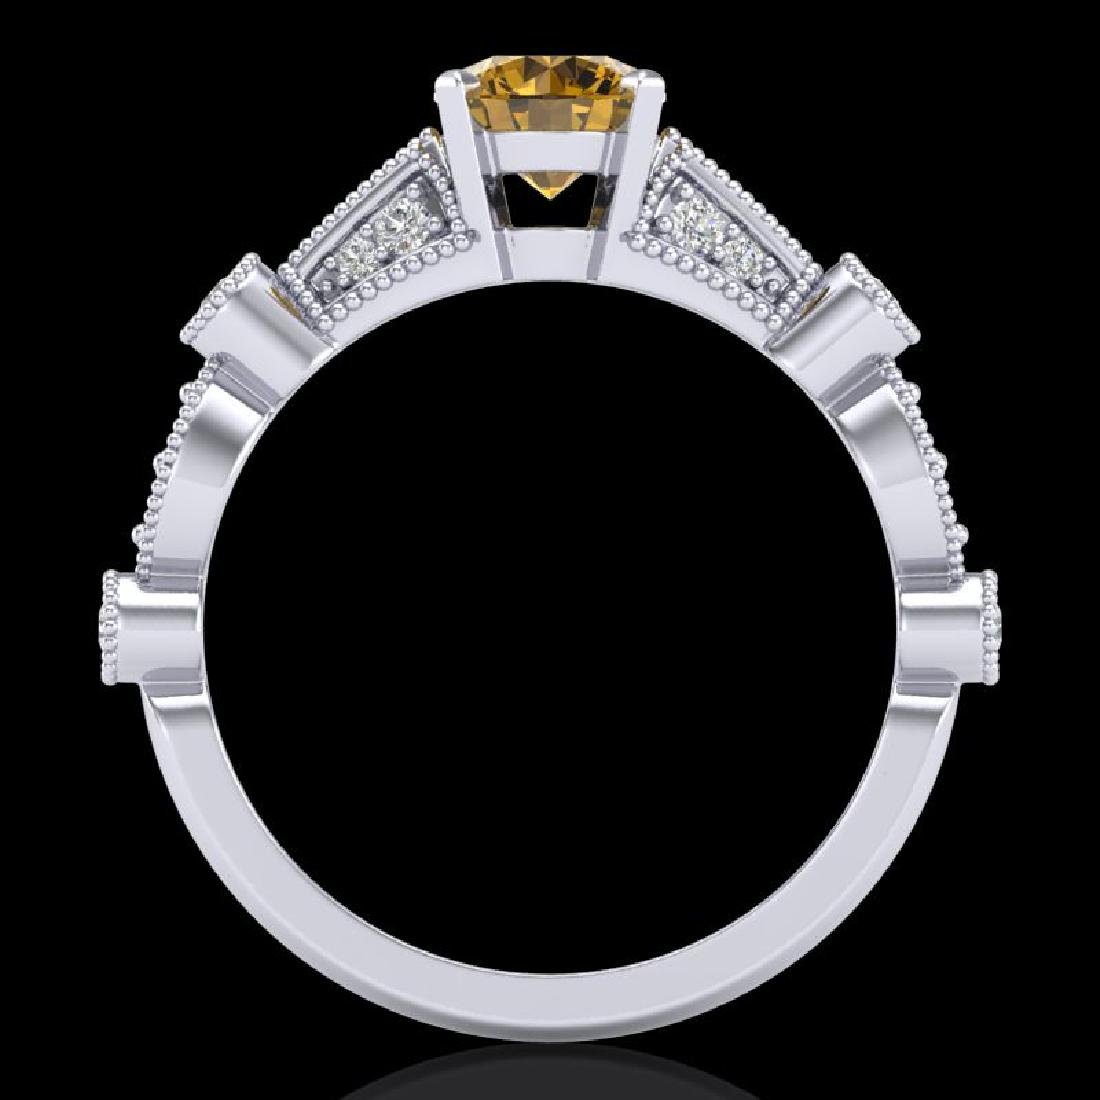 1.03 CTW Intense Fancy Yellow Diamond Engagement Art - 3